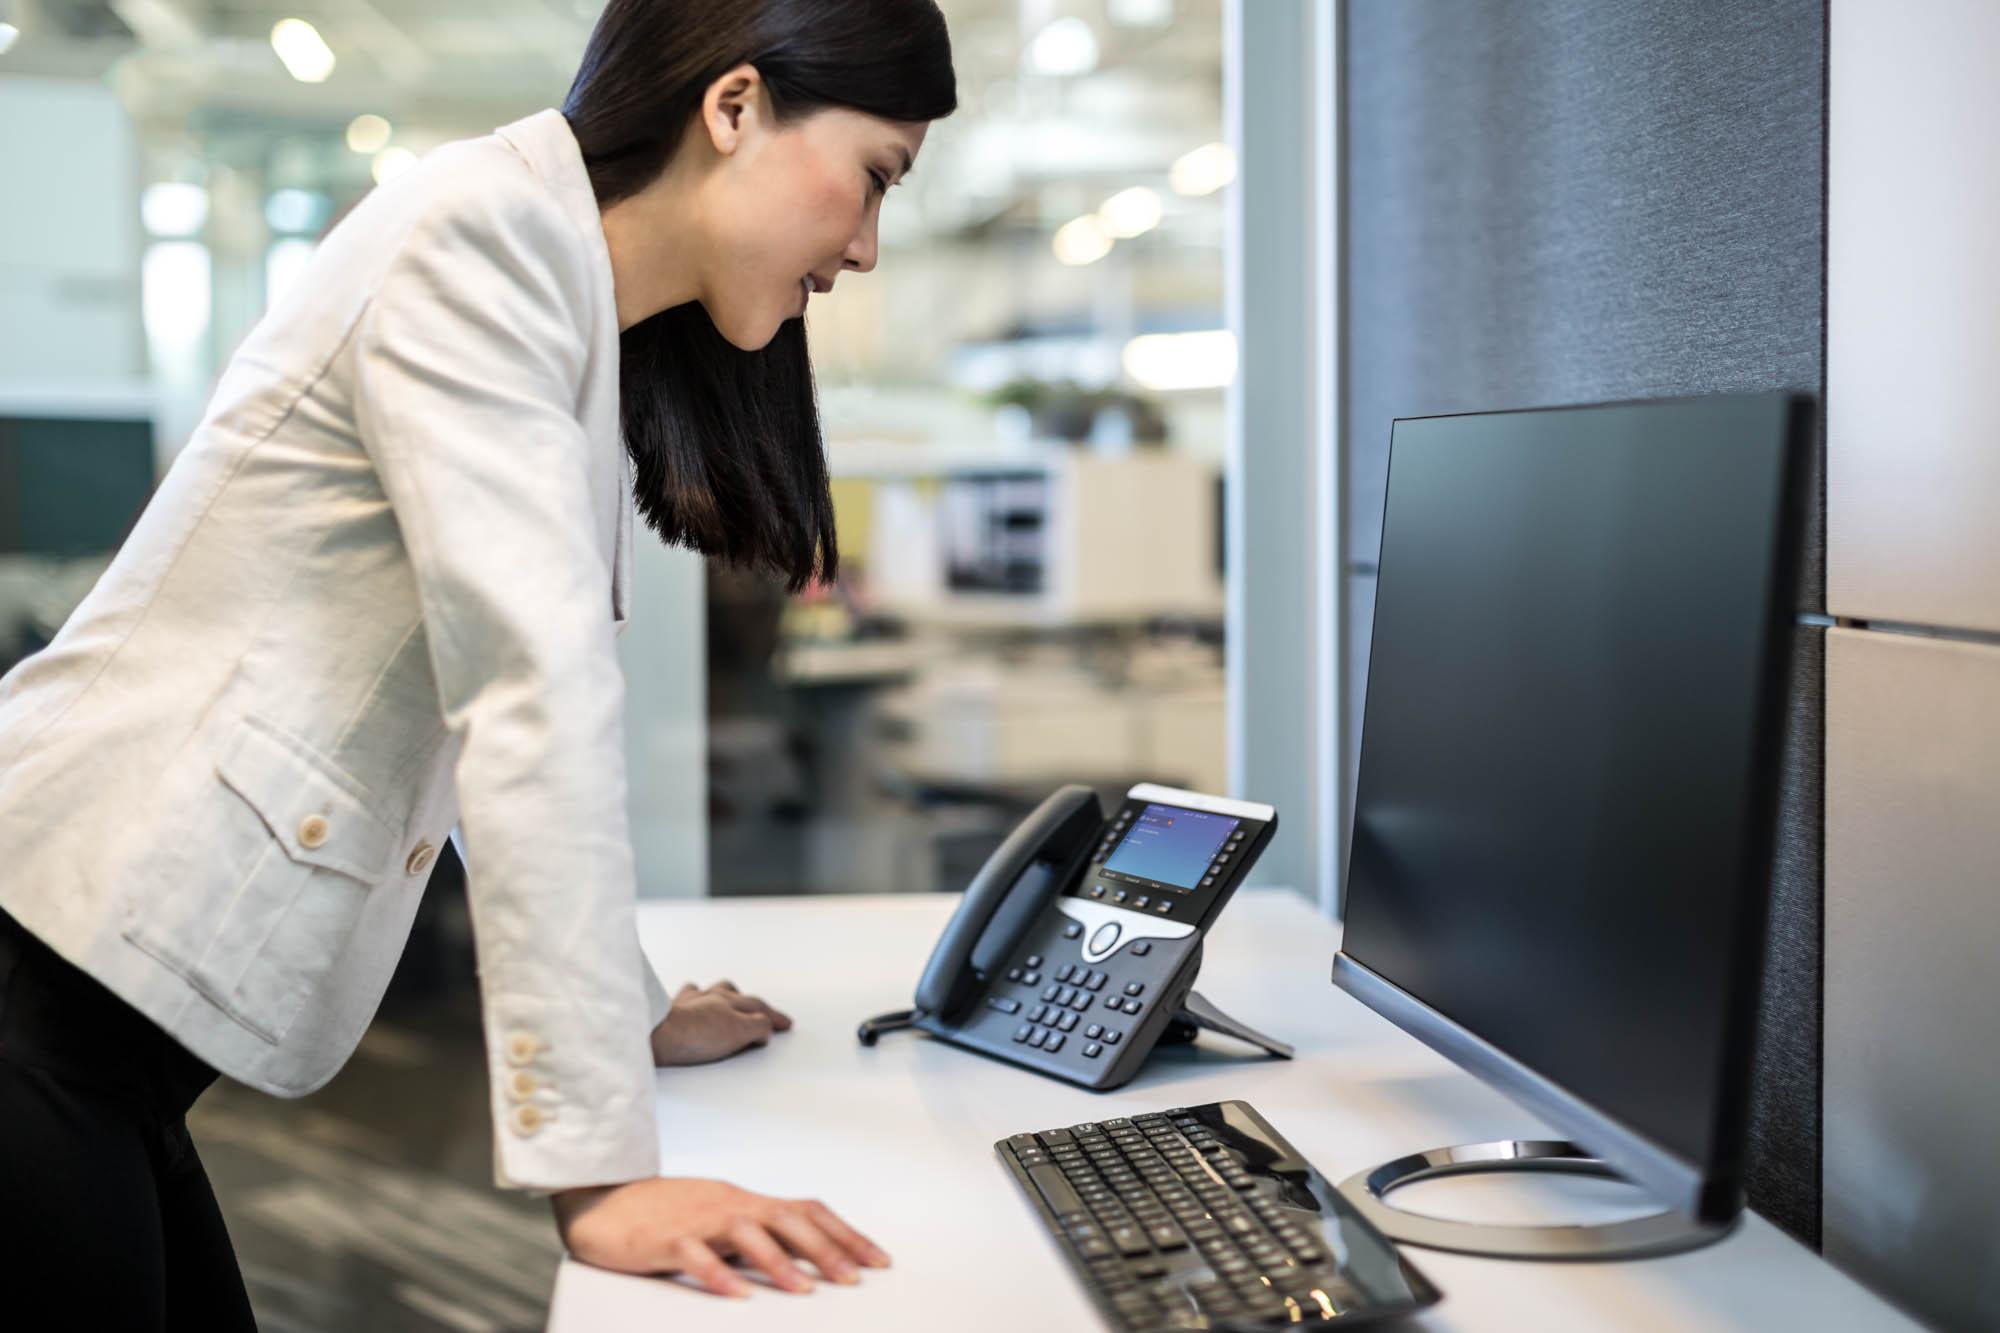 Woman-standing-near-desk-Jordan-Reeder.jpg